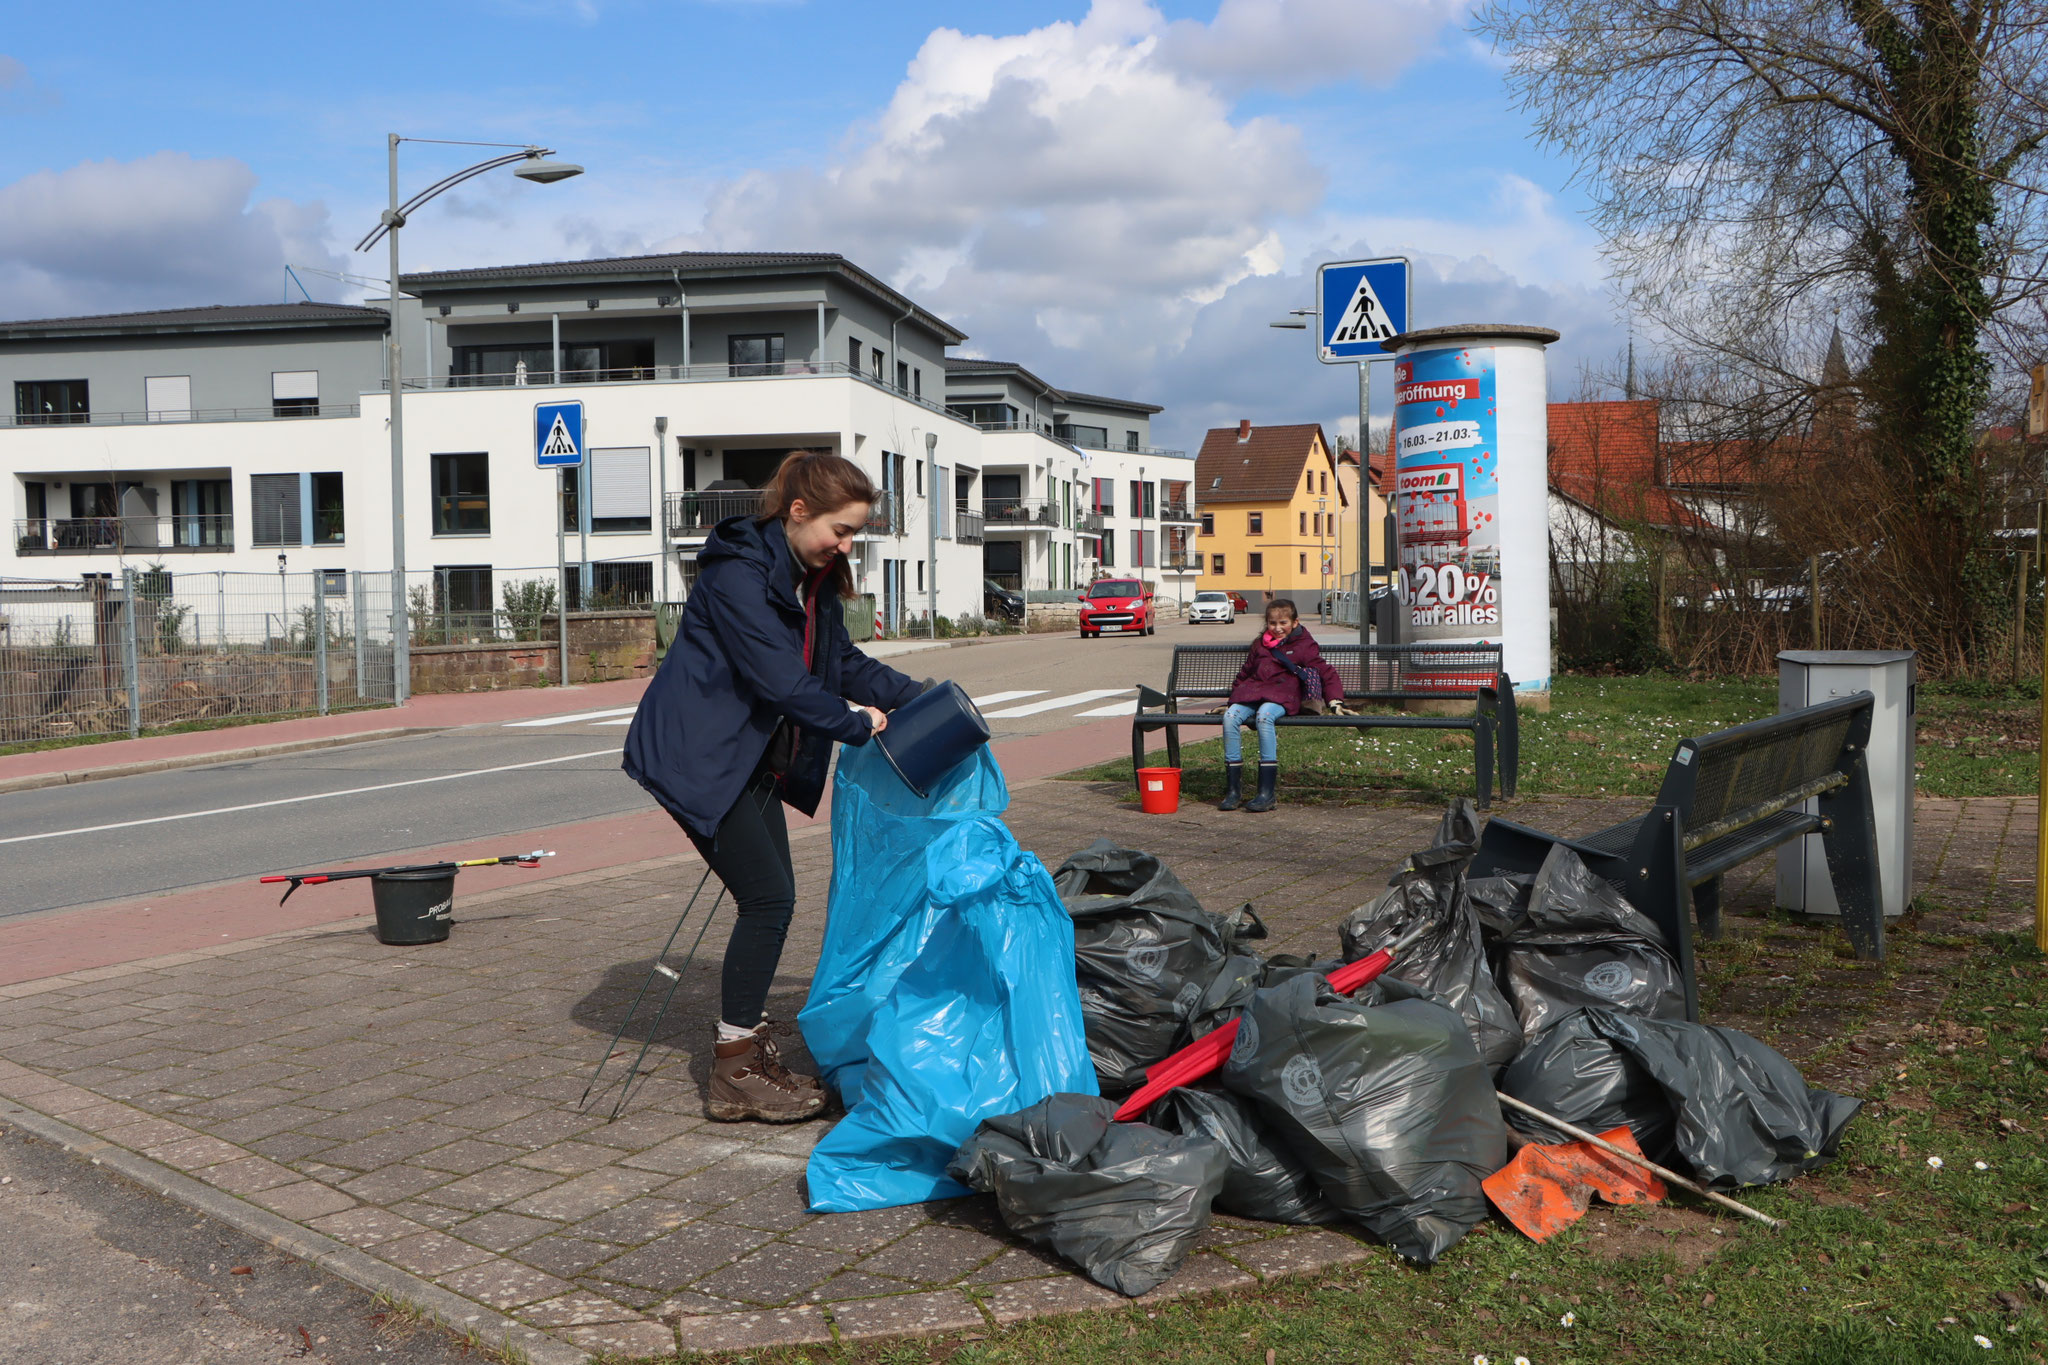 Gefüllte Müllsäcke zum abholen bereit (Foto: B. Budig)